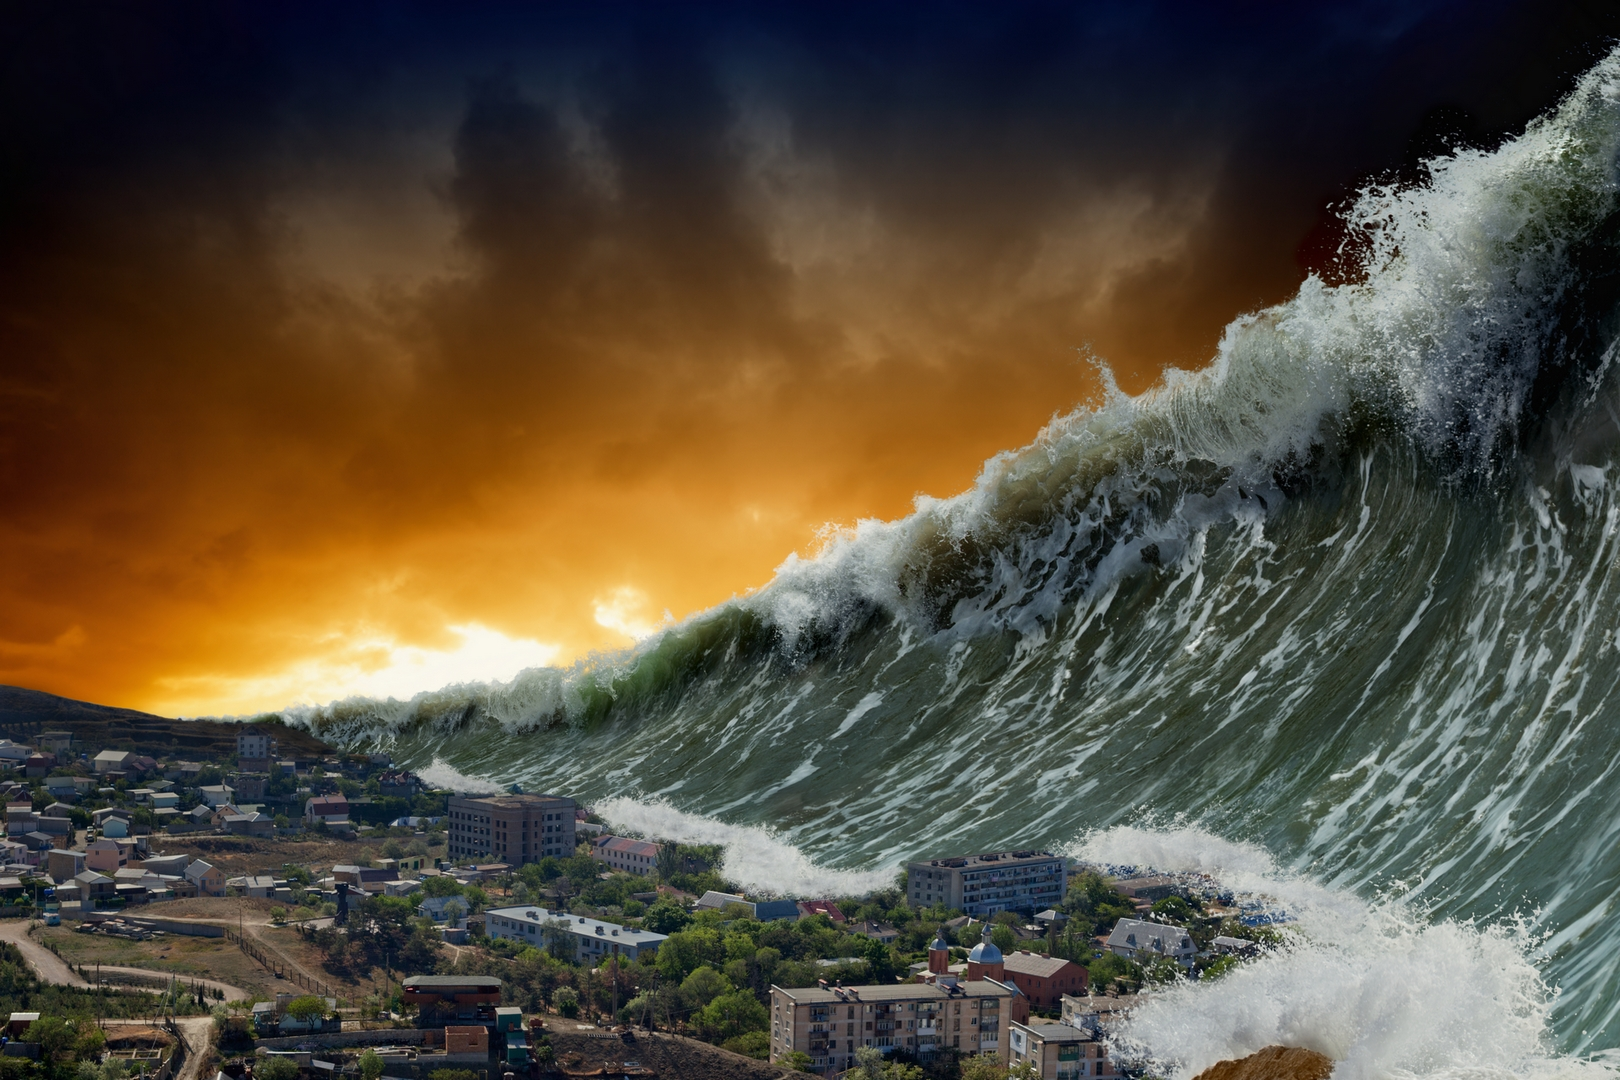 mega tsunami ped 73 tisci lety zaplavila kapverdy vlna